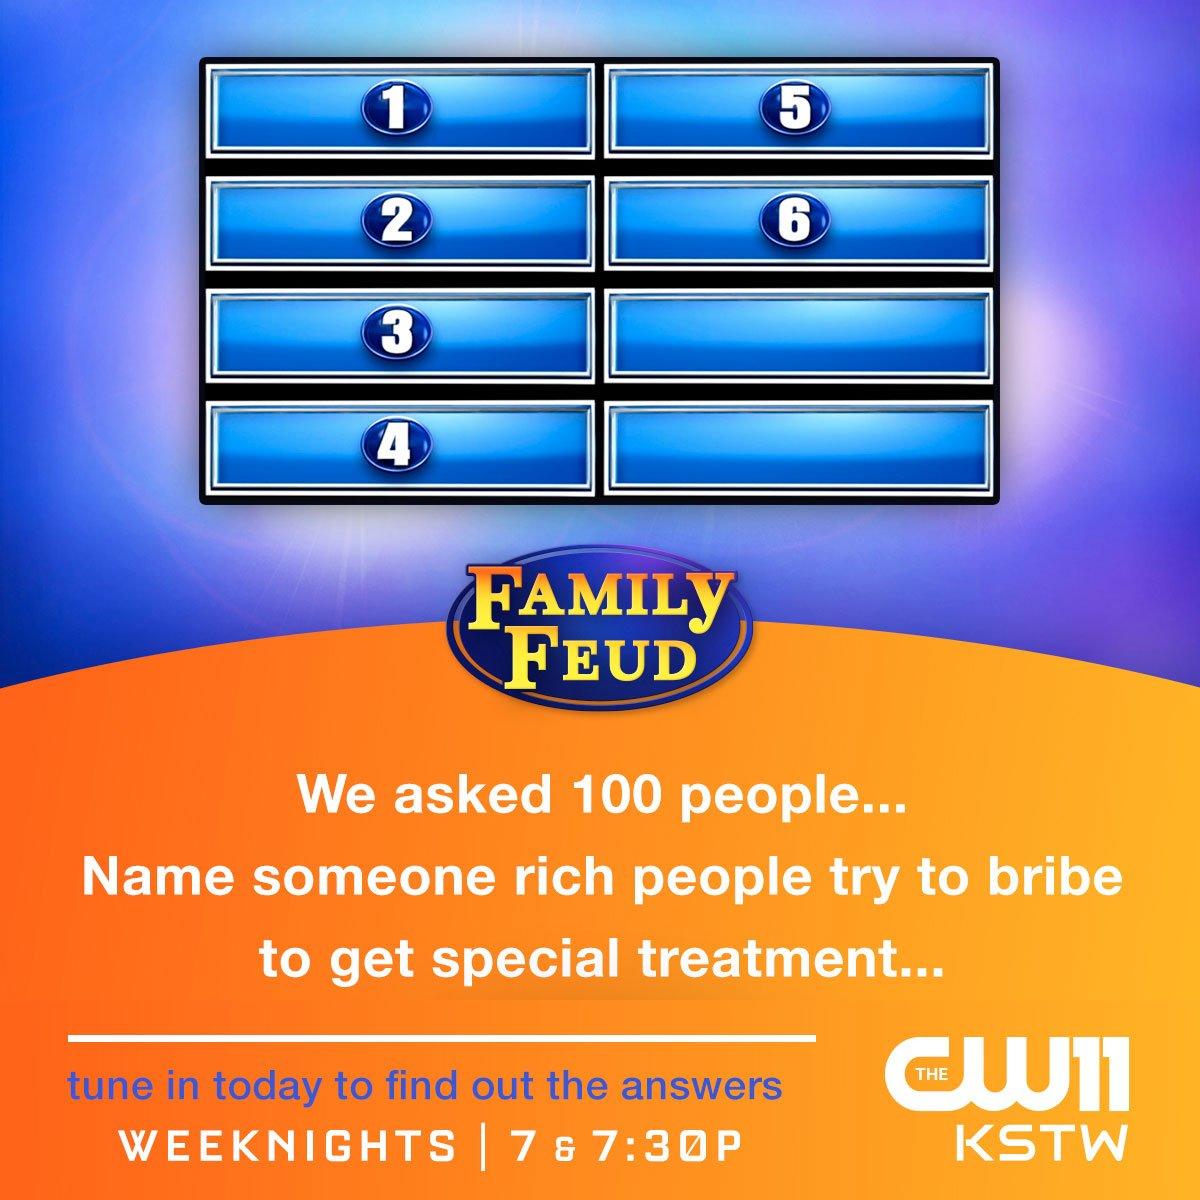 Cancelo #familyfeud no Twitter